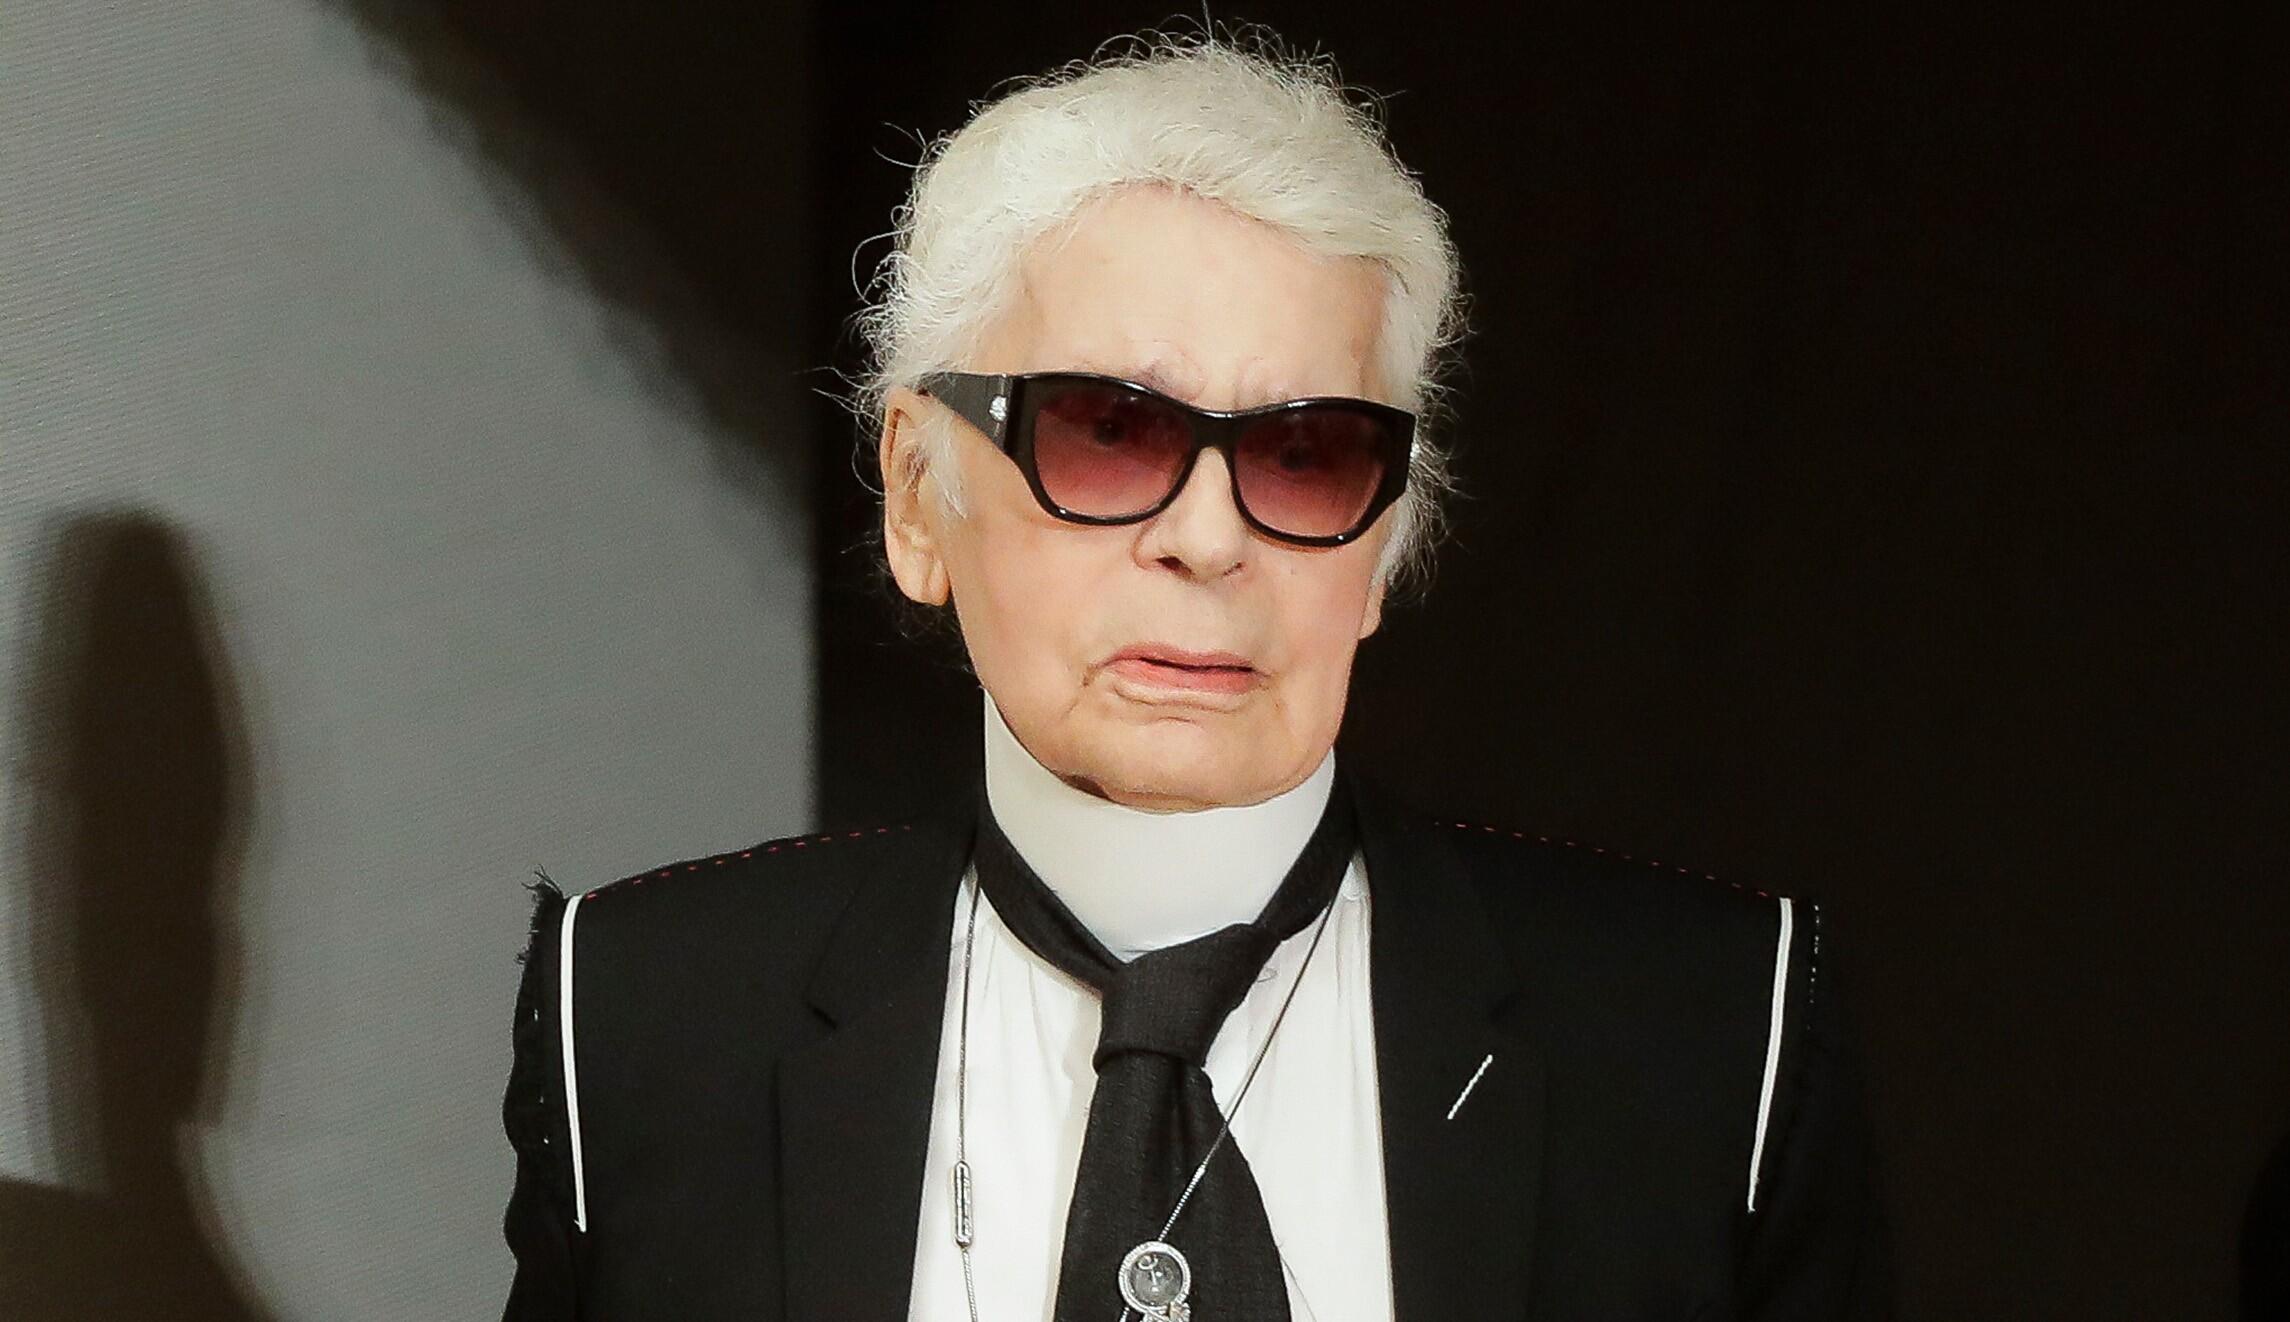 Fashion Icon Karl Lagerfeld Threatens To Renounce German Citizenship